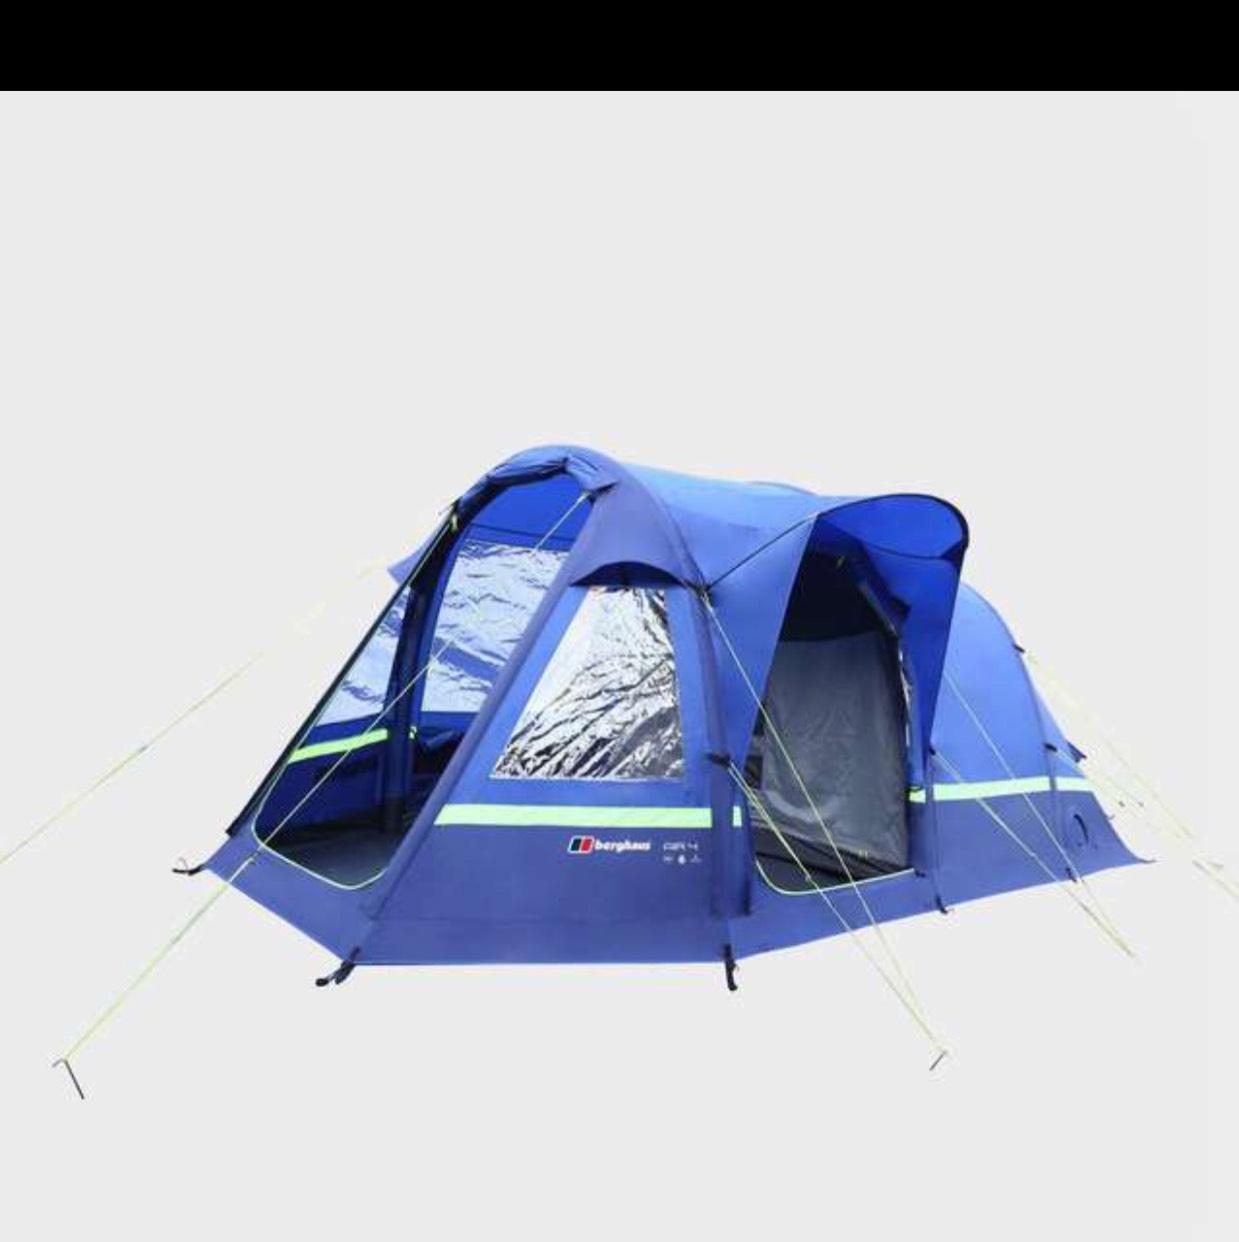 Berghaus Air 4 Inflatable Tent £299 Blacks